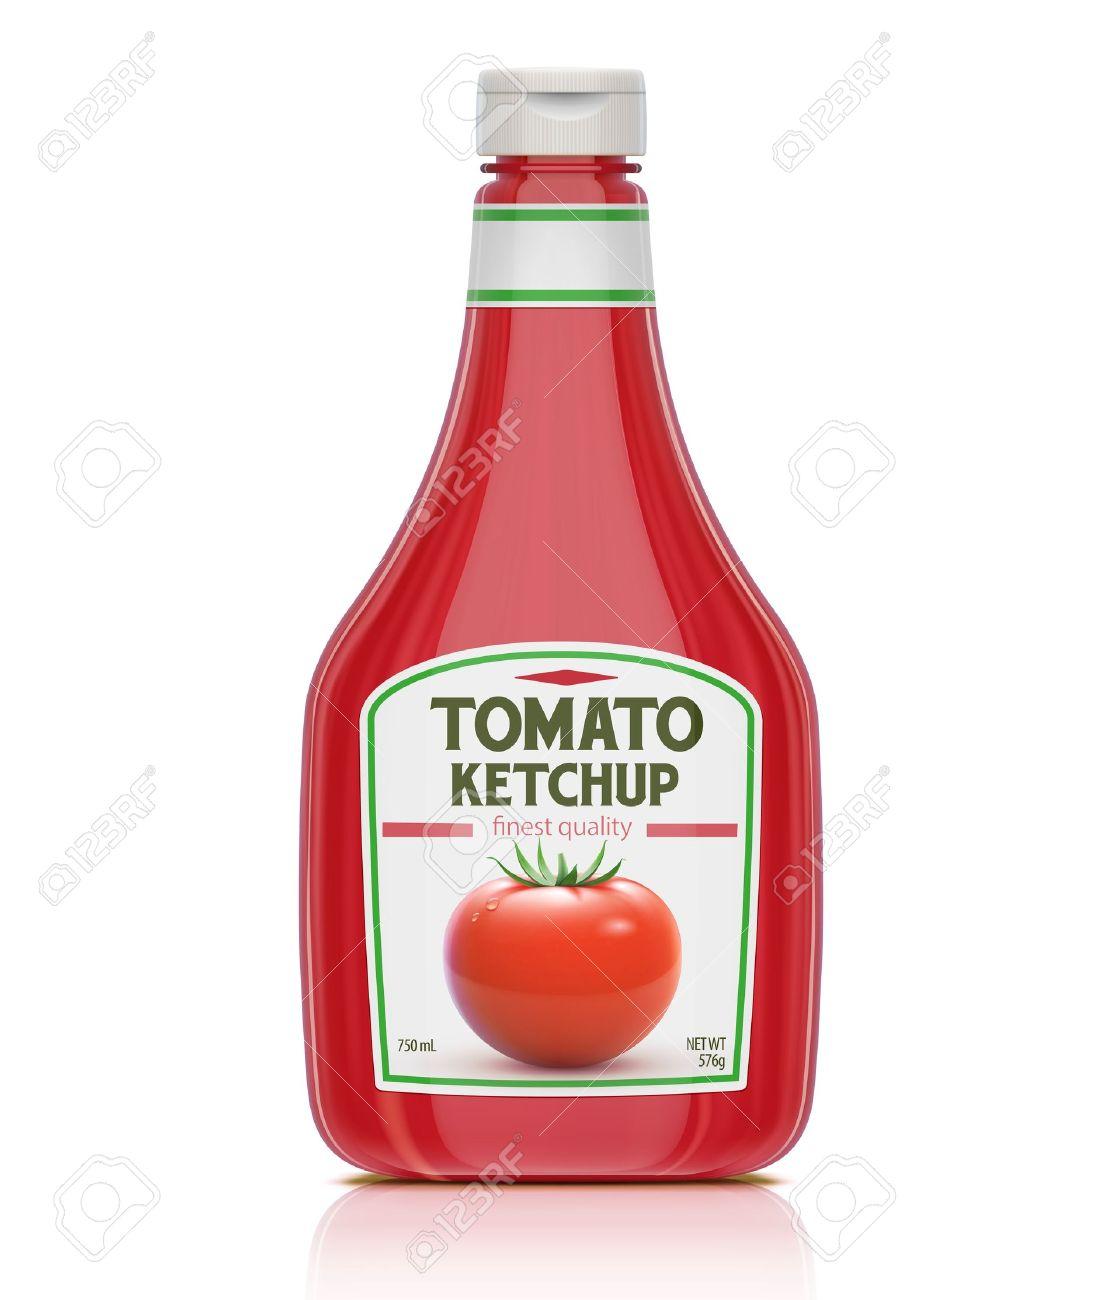 10,942 Ketchup Stock Illustrations, Cliparts And Royalty Free.